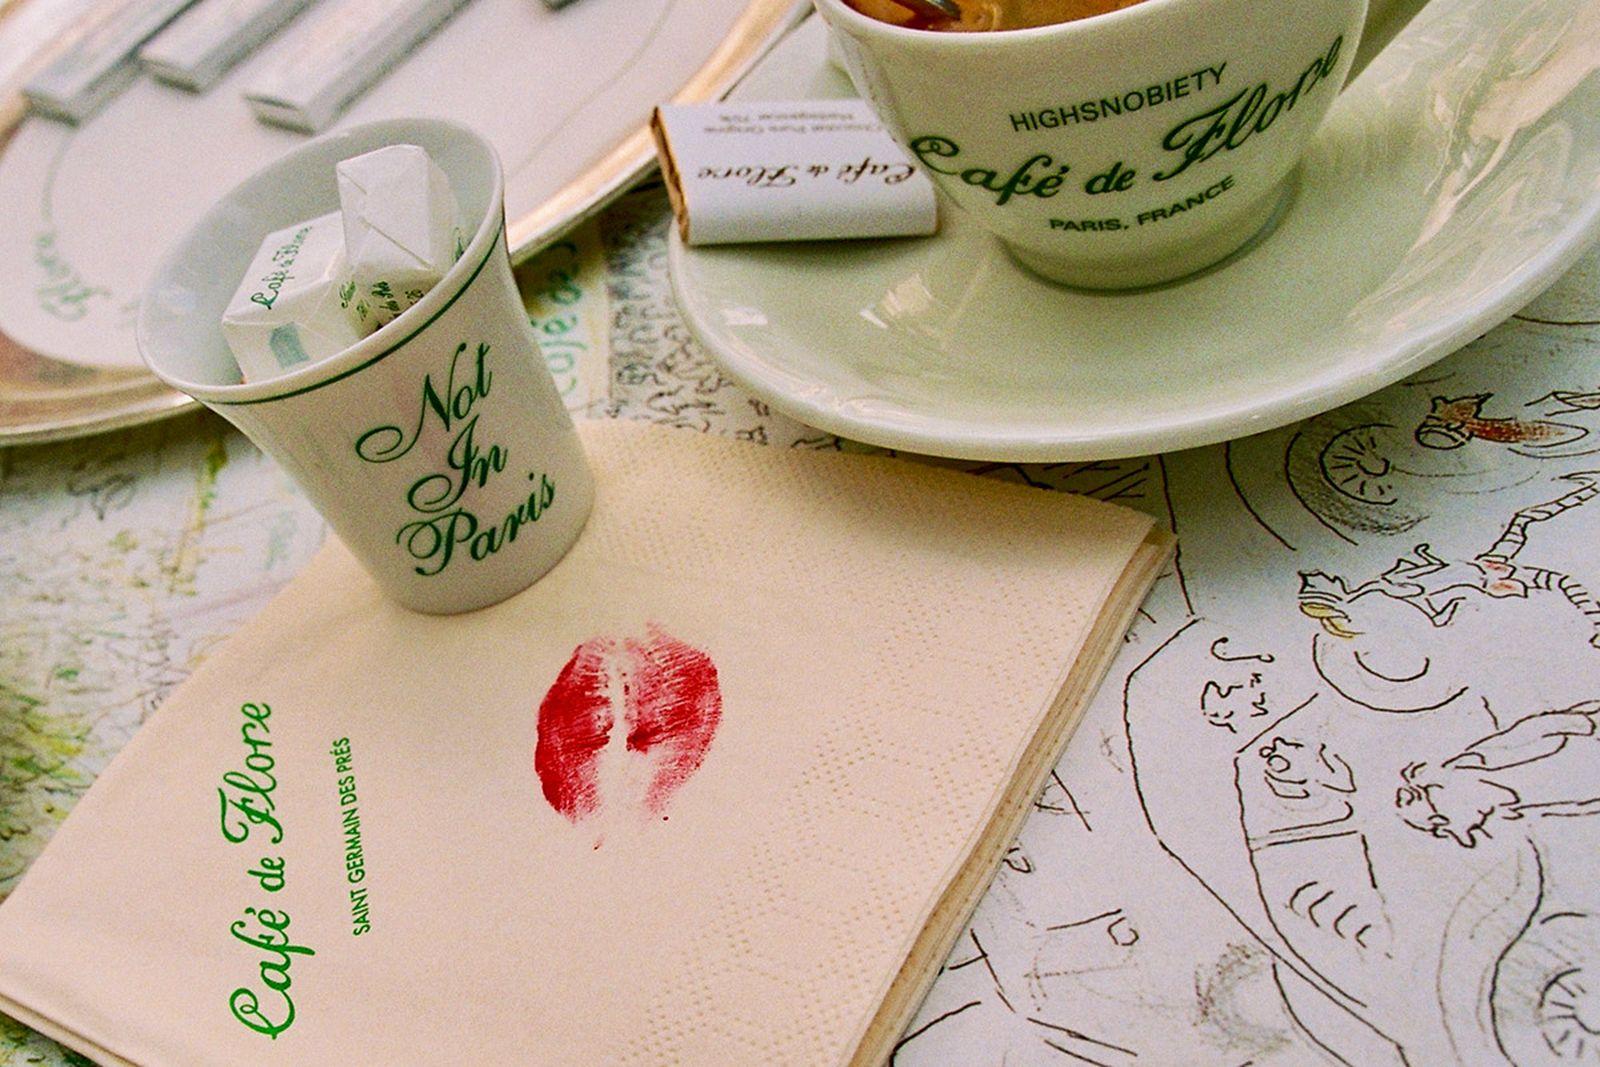 cafe-de-flore-fashion-week-not-in-paris-lookbook-013